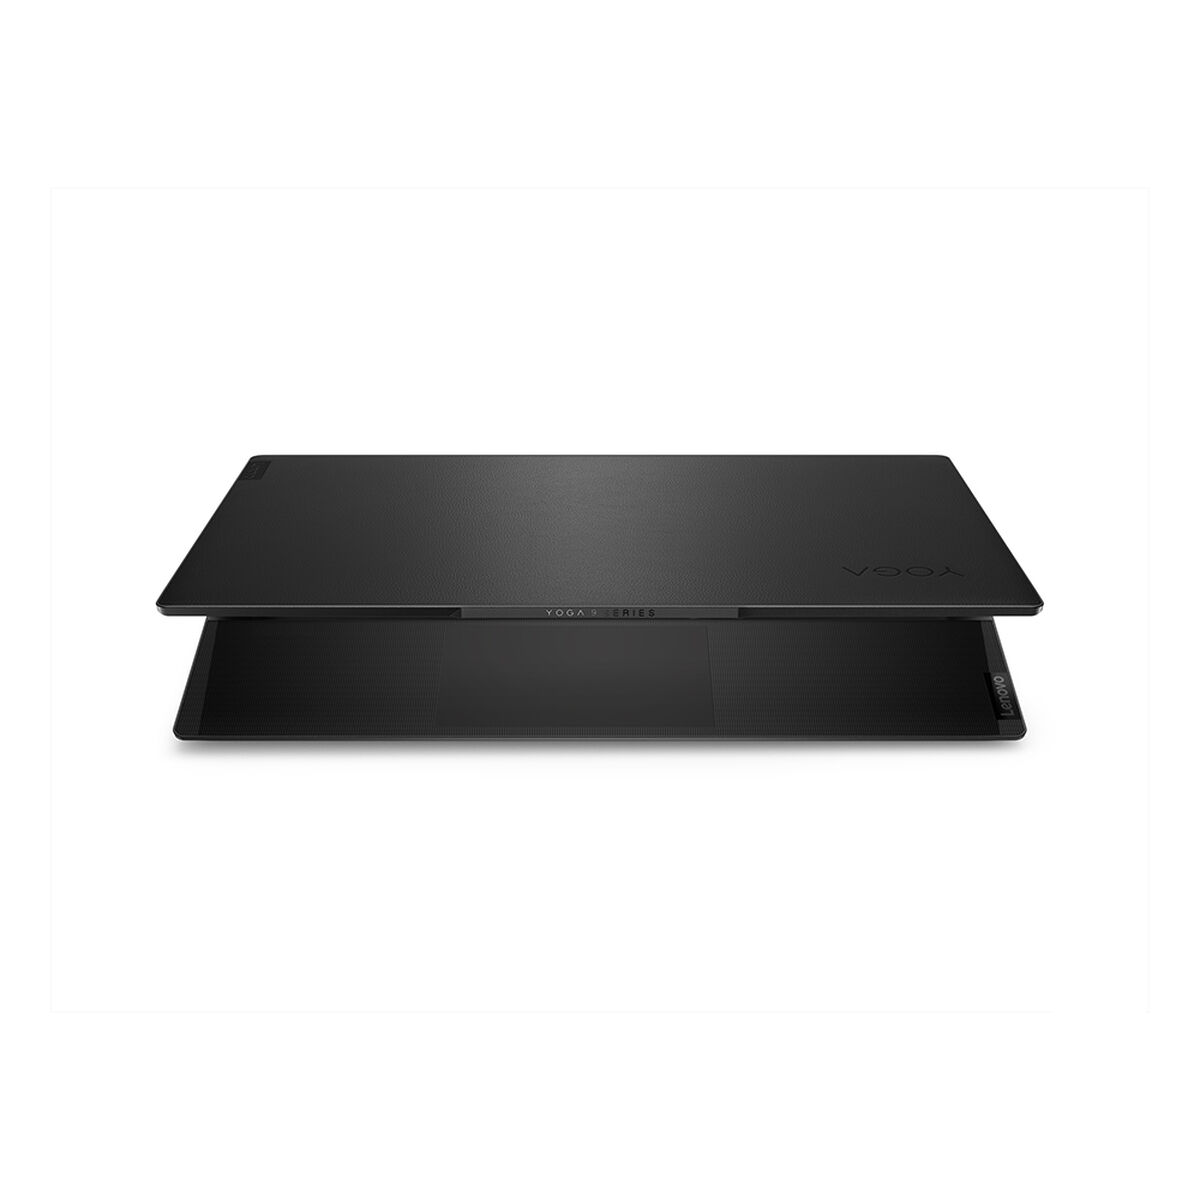 "Notebook Lenovo Yoga Slim 9i Core i7-1165G7 16GB 1TB SSD 14"" 4K"